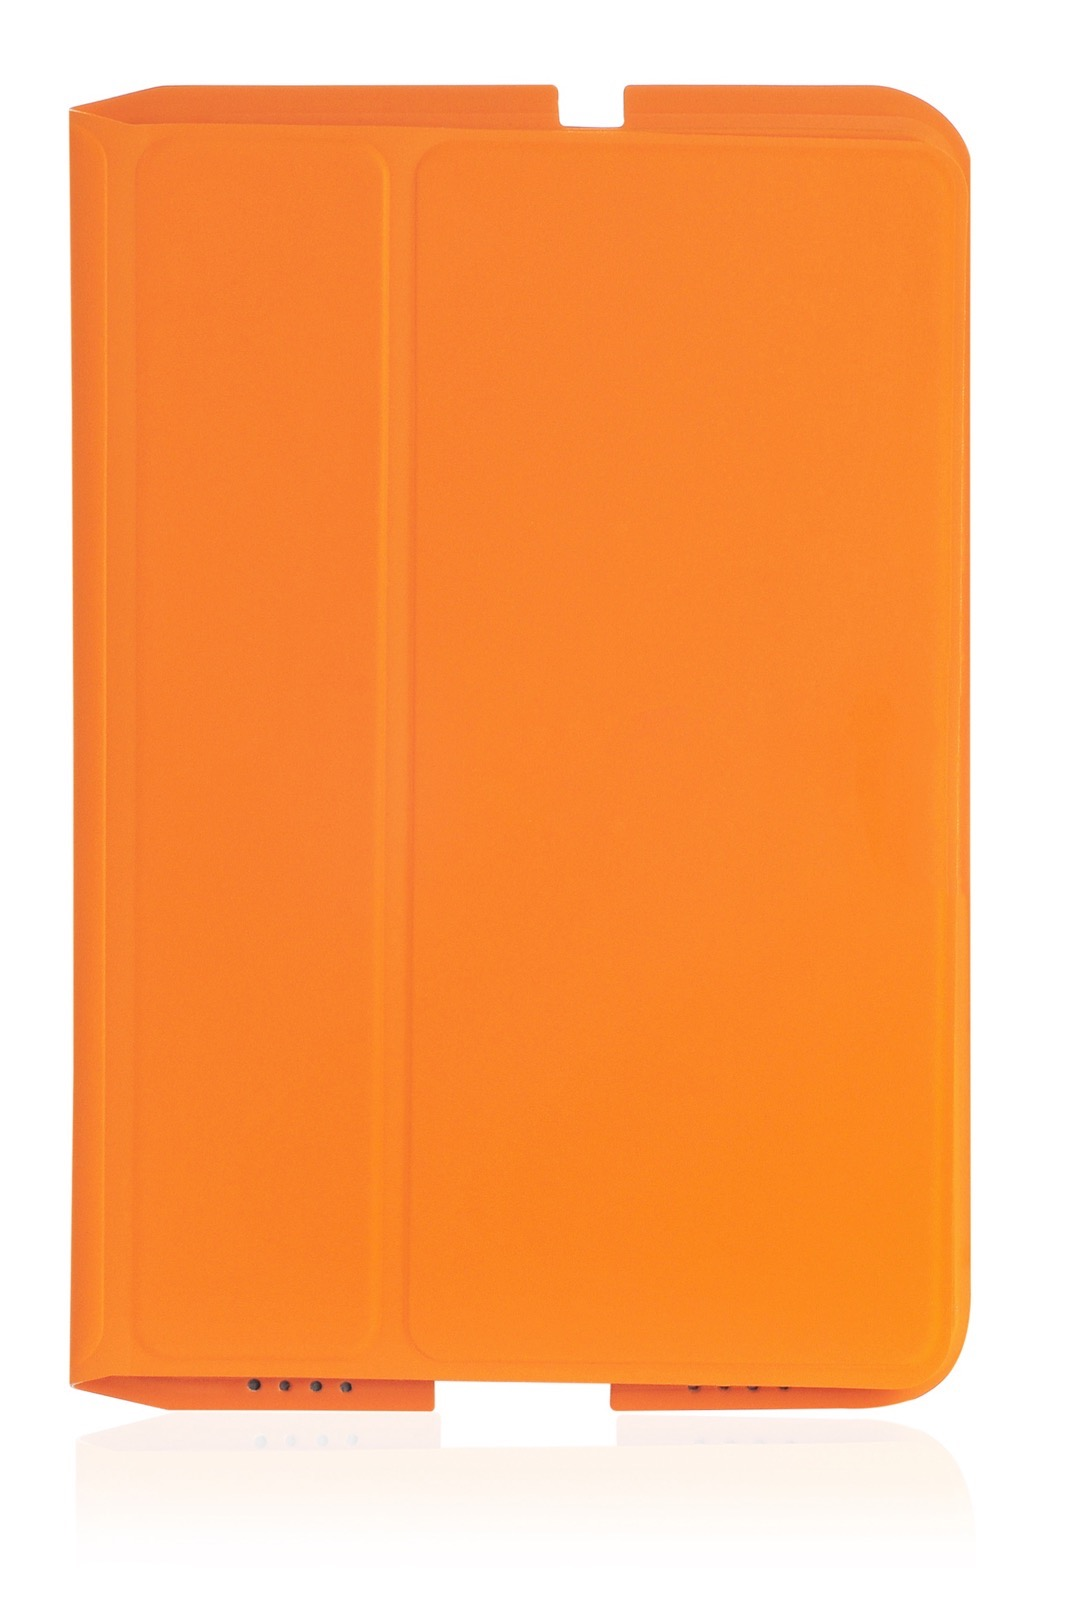 "Чехол для планшета iNeez книжка полиуретан cover для Samsung Tab 7.7"", оранжевый"